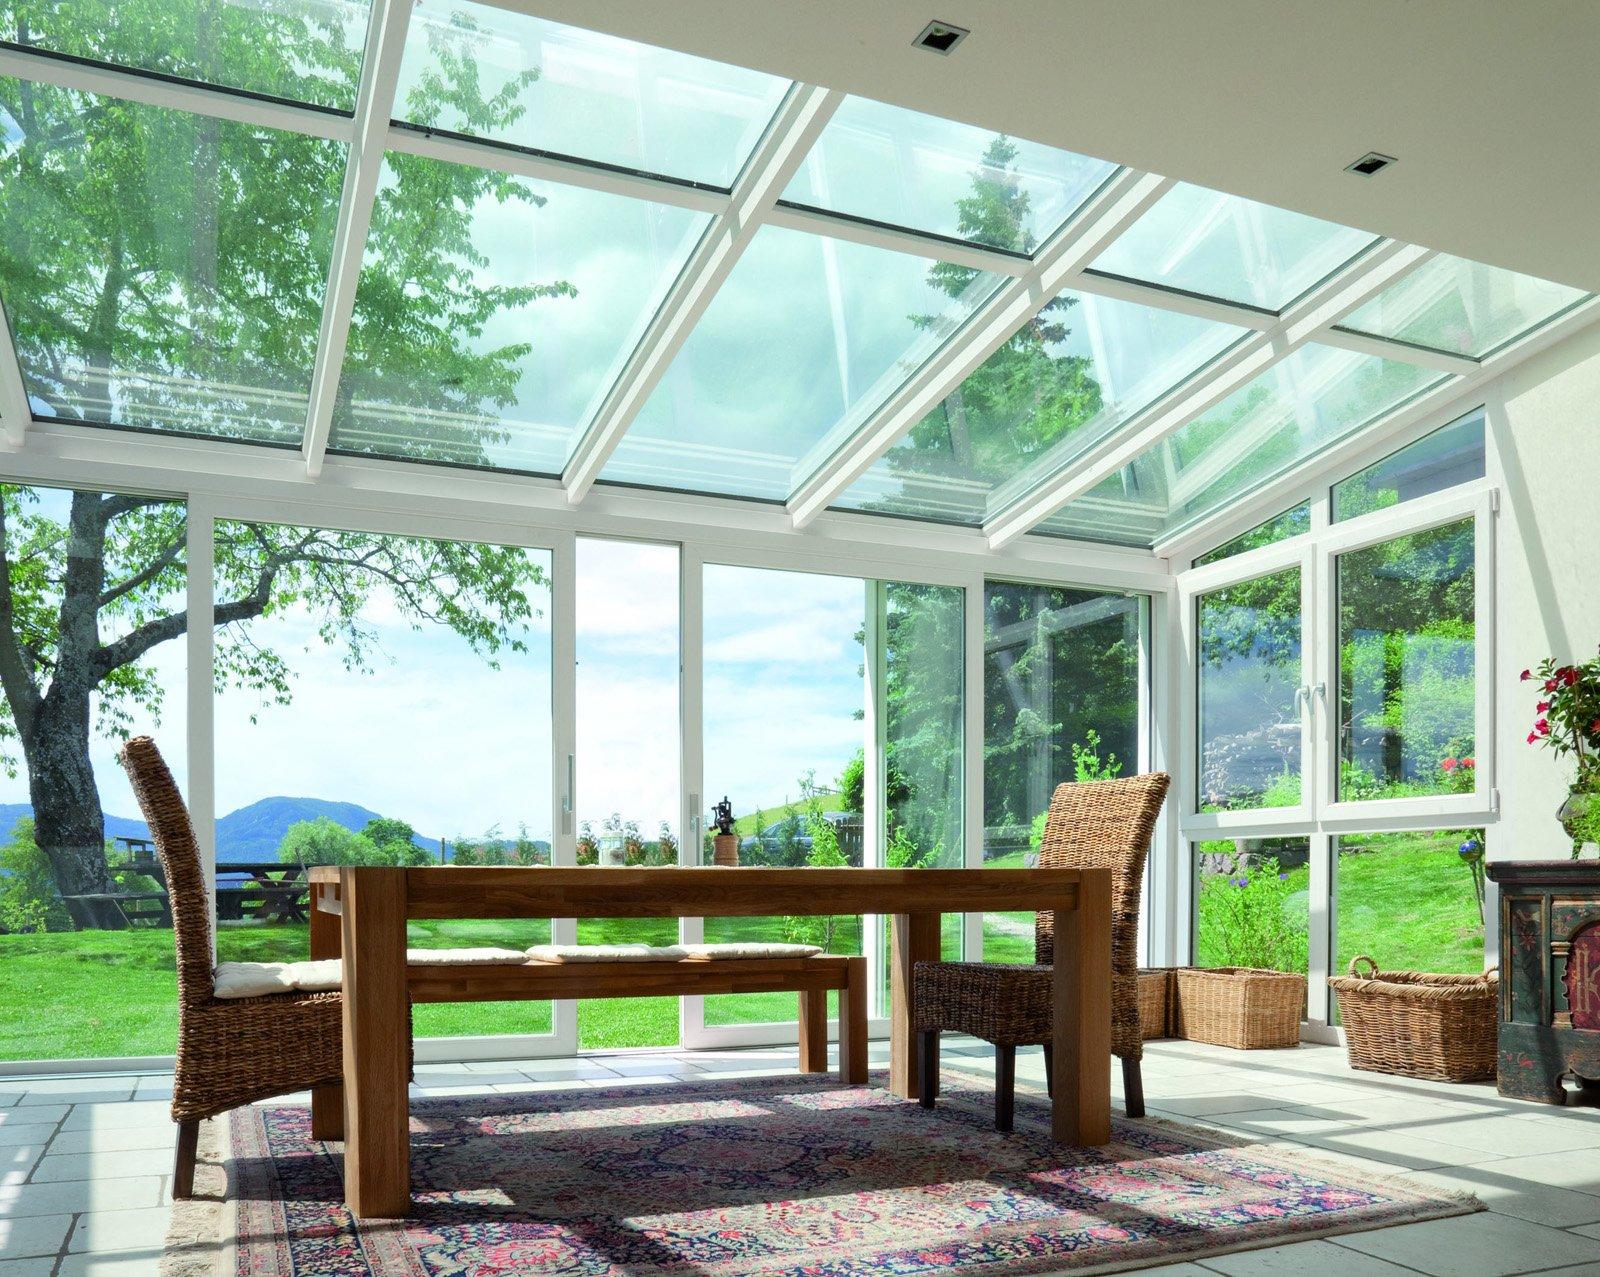 Finestre tipi di apertura cose di casa - Cucine con vetrate ...